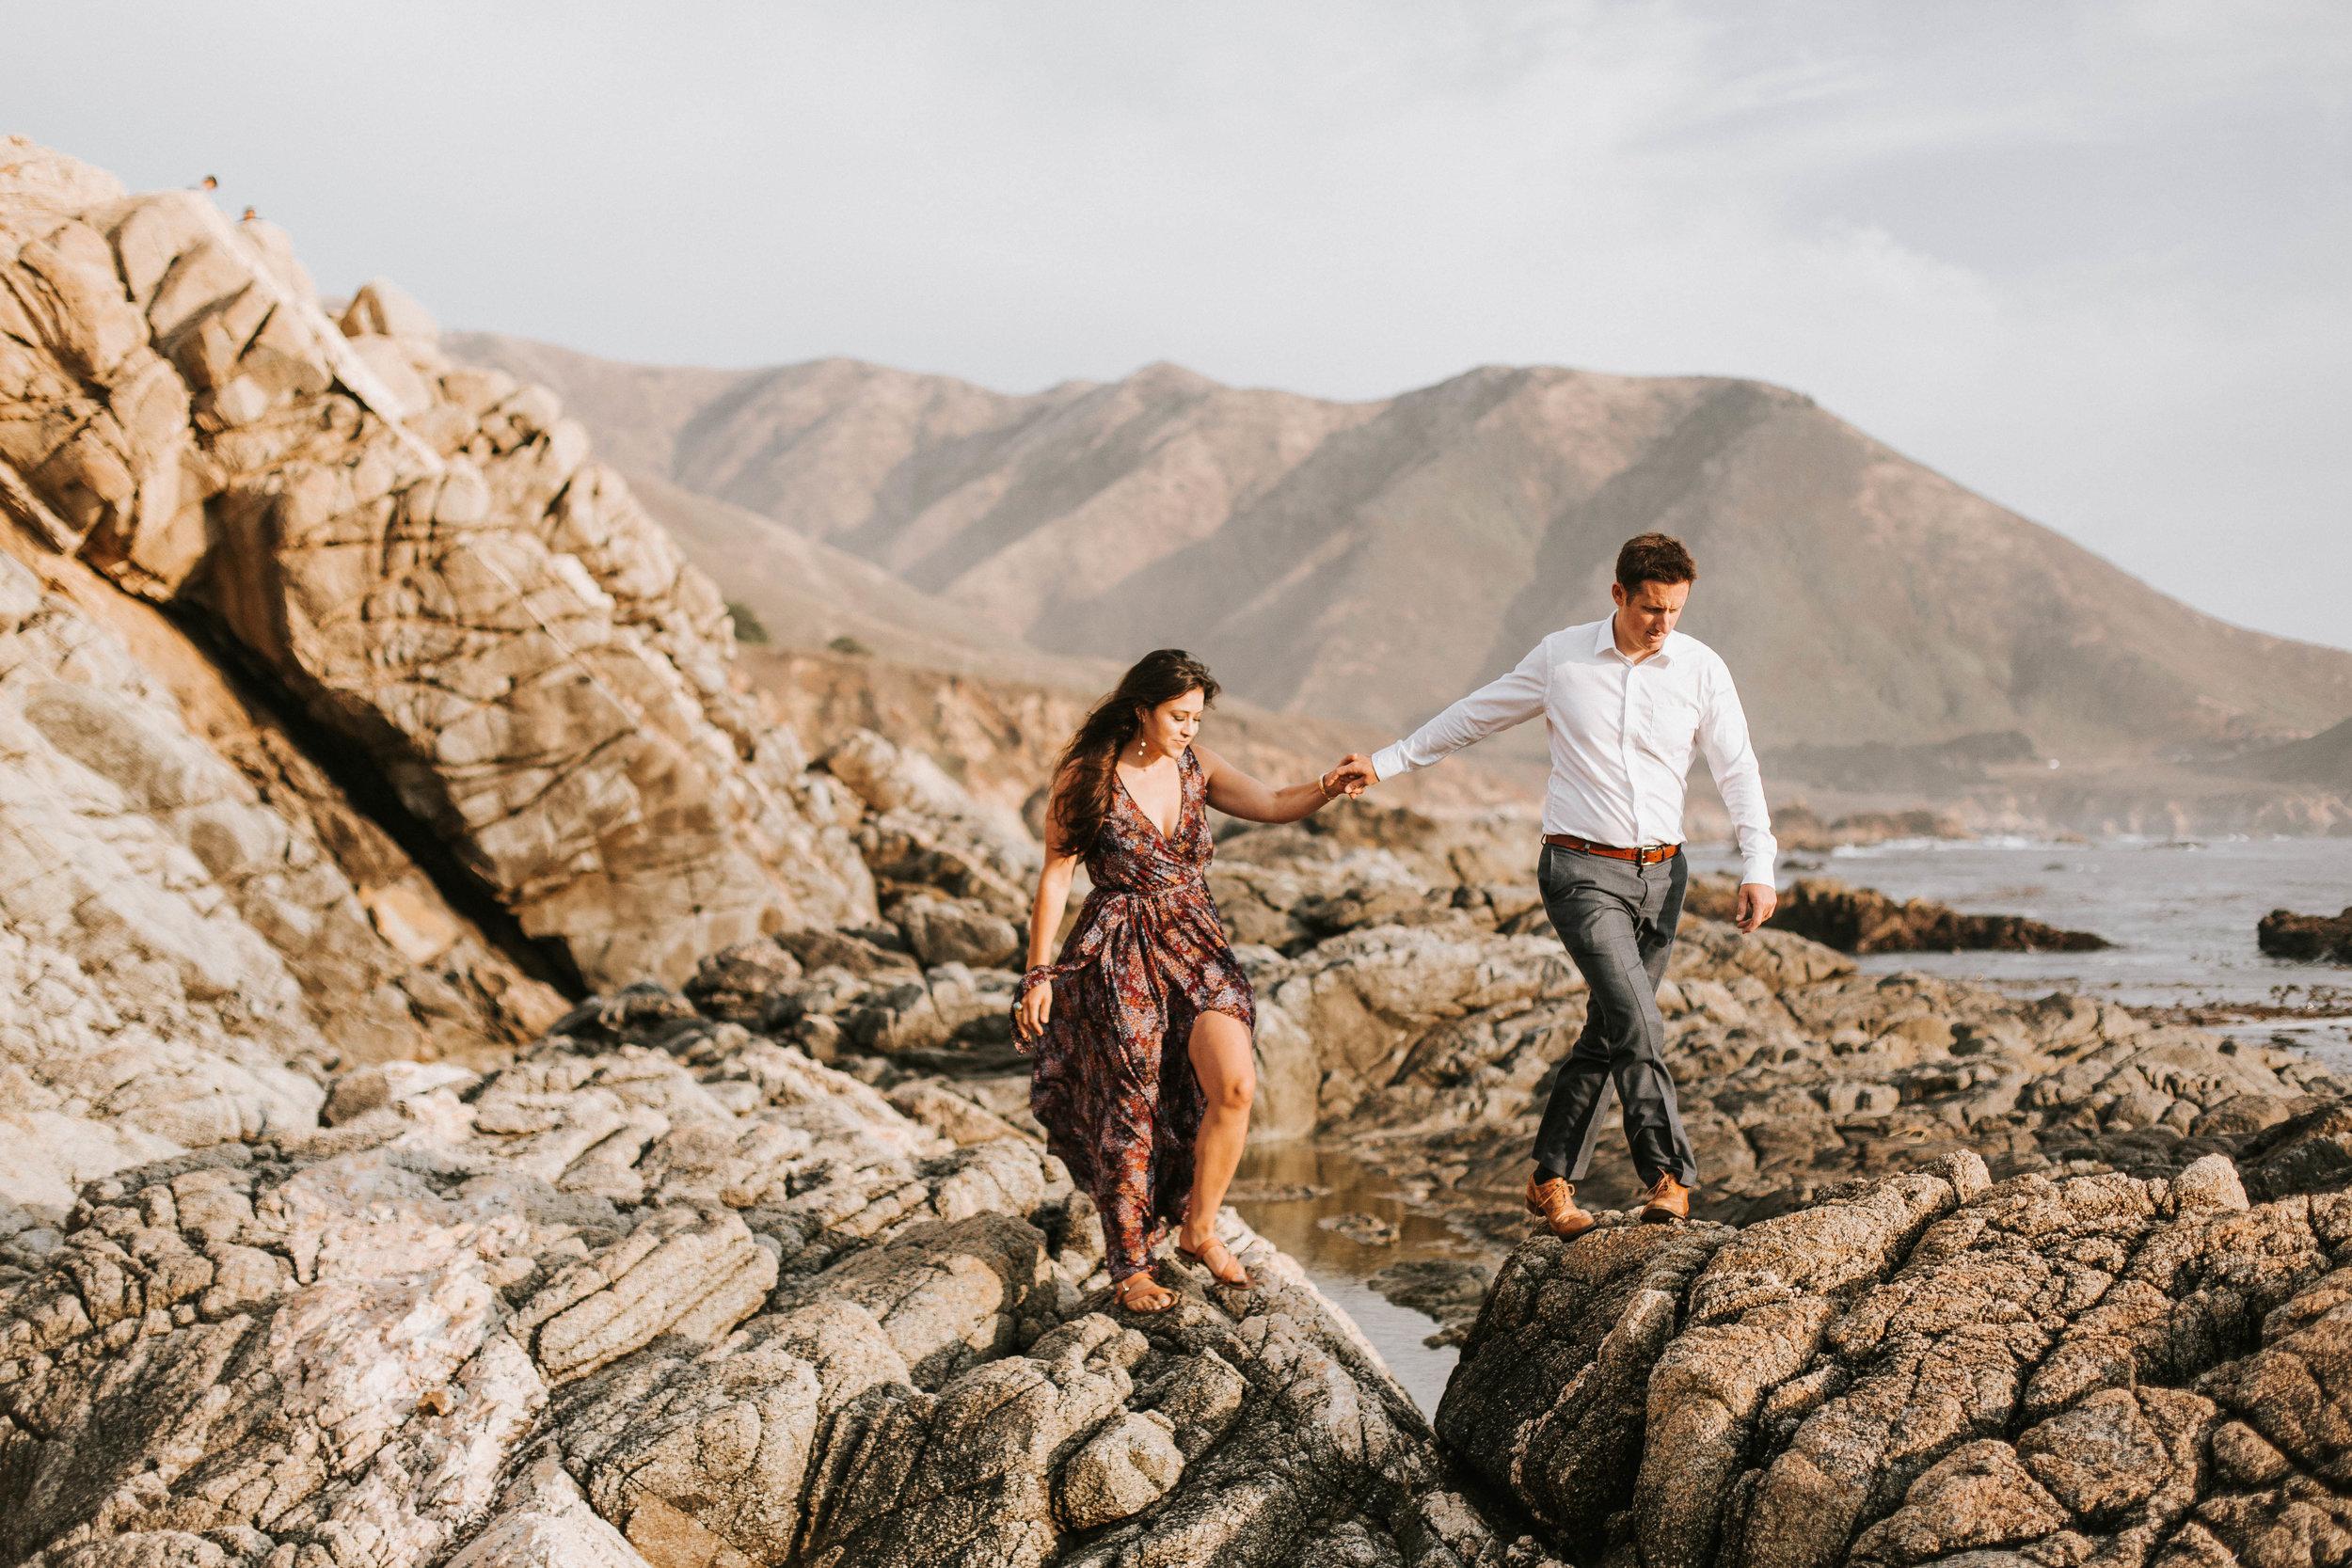 nicole-daacke-photography-big-sur-california-coast-adventure-engagement-photos-adventurous-elopement-intimate-wedding-photographer-golden-coastal-cali-engagement-session-2.jpg